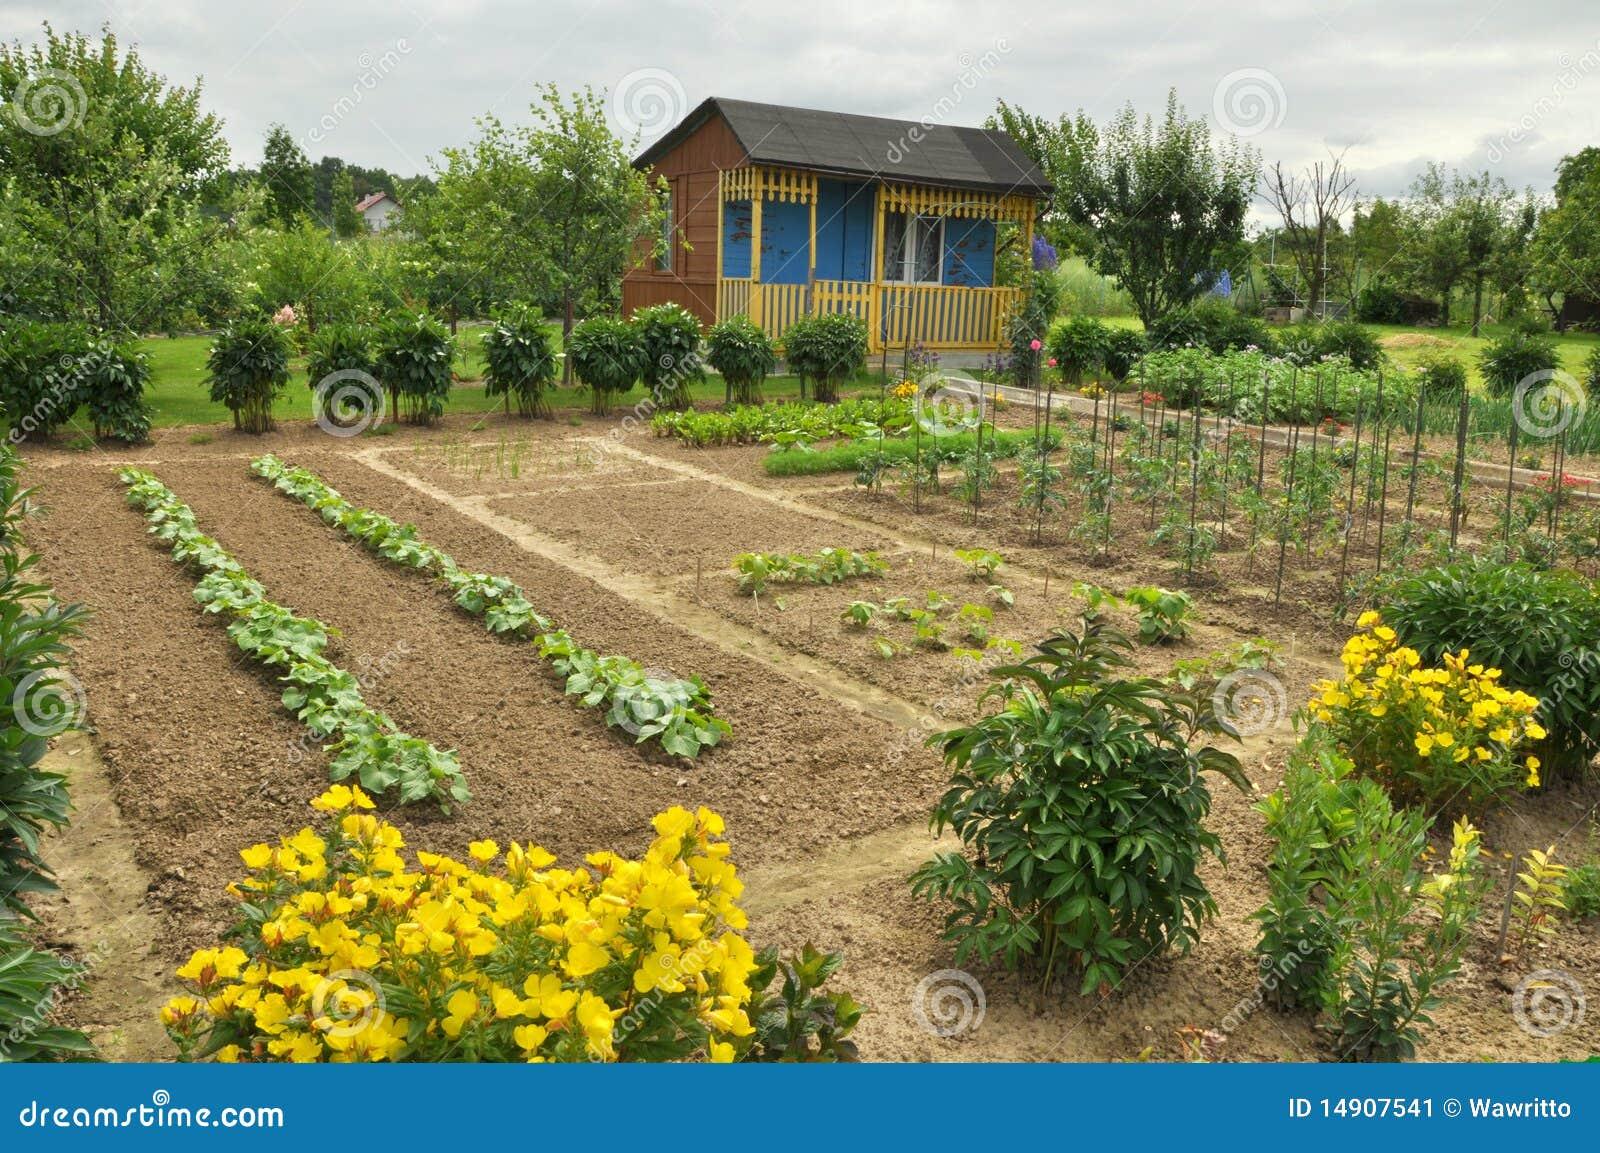 Cabaña y jardín vegetal